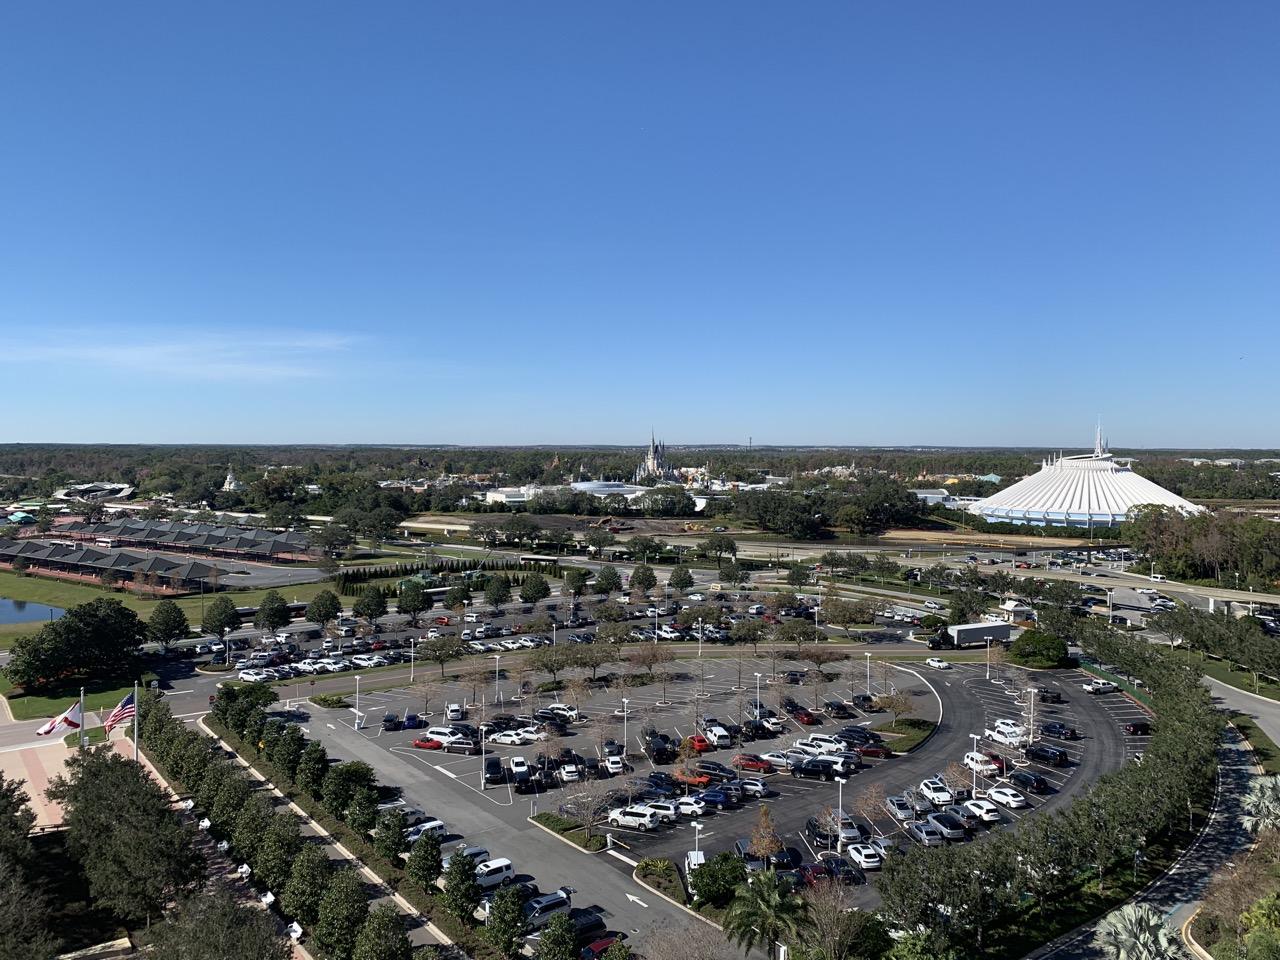 disney world best deluxe resort hotel ranking 00 theme park view.jpeg